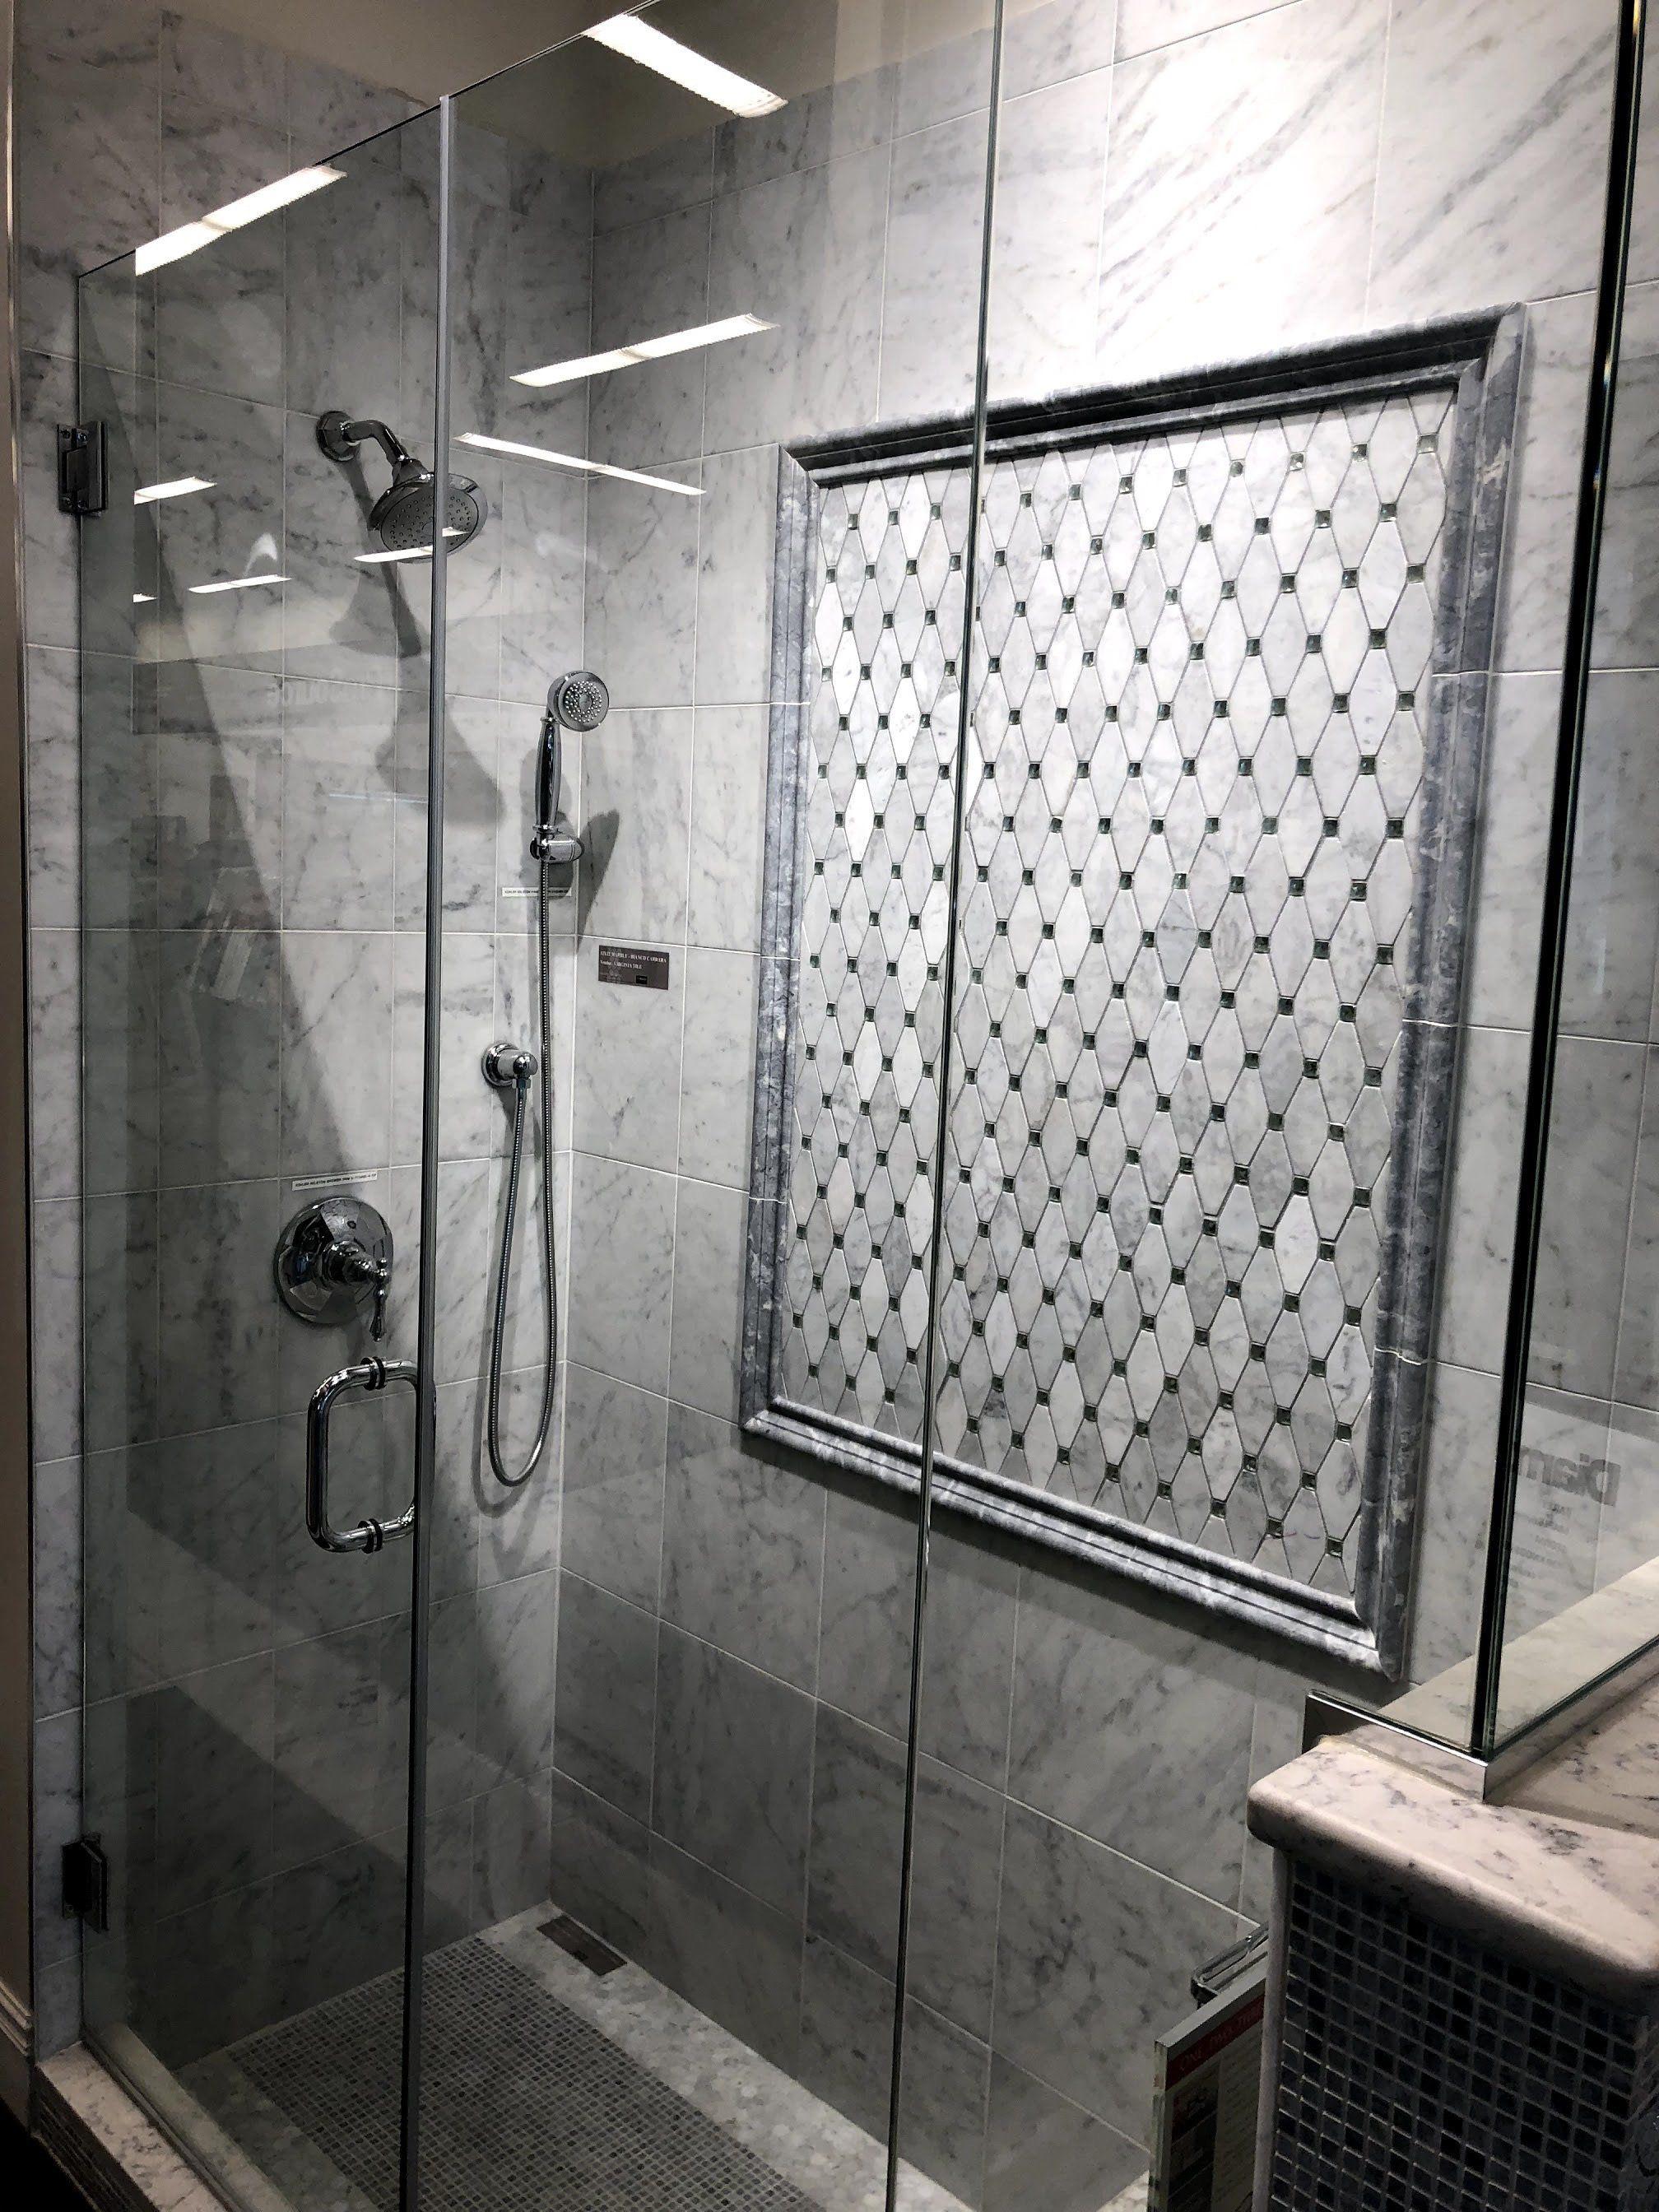 Shower Tile Design Bianco Carrara Marble Tile S And Mosaics Elegant Interior Design Id Bathroom Interior Design Bathroom Interior Bathroom Design